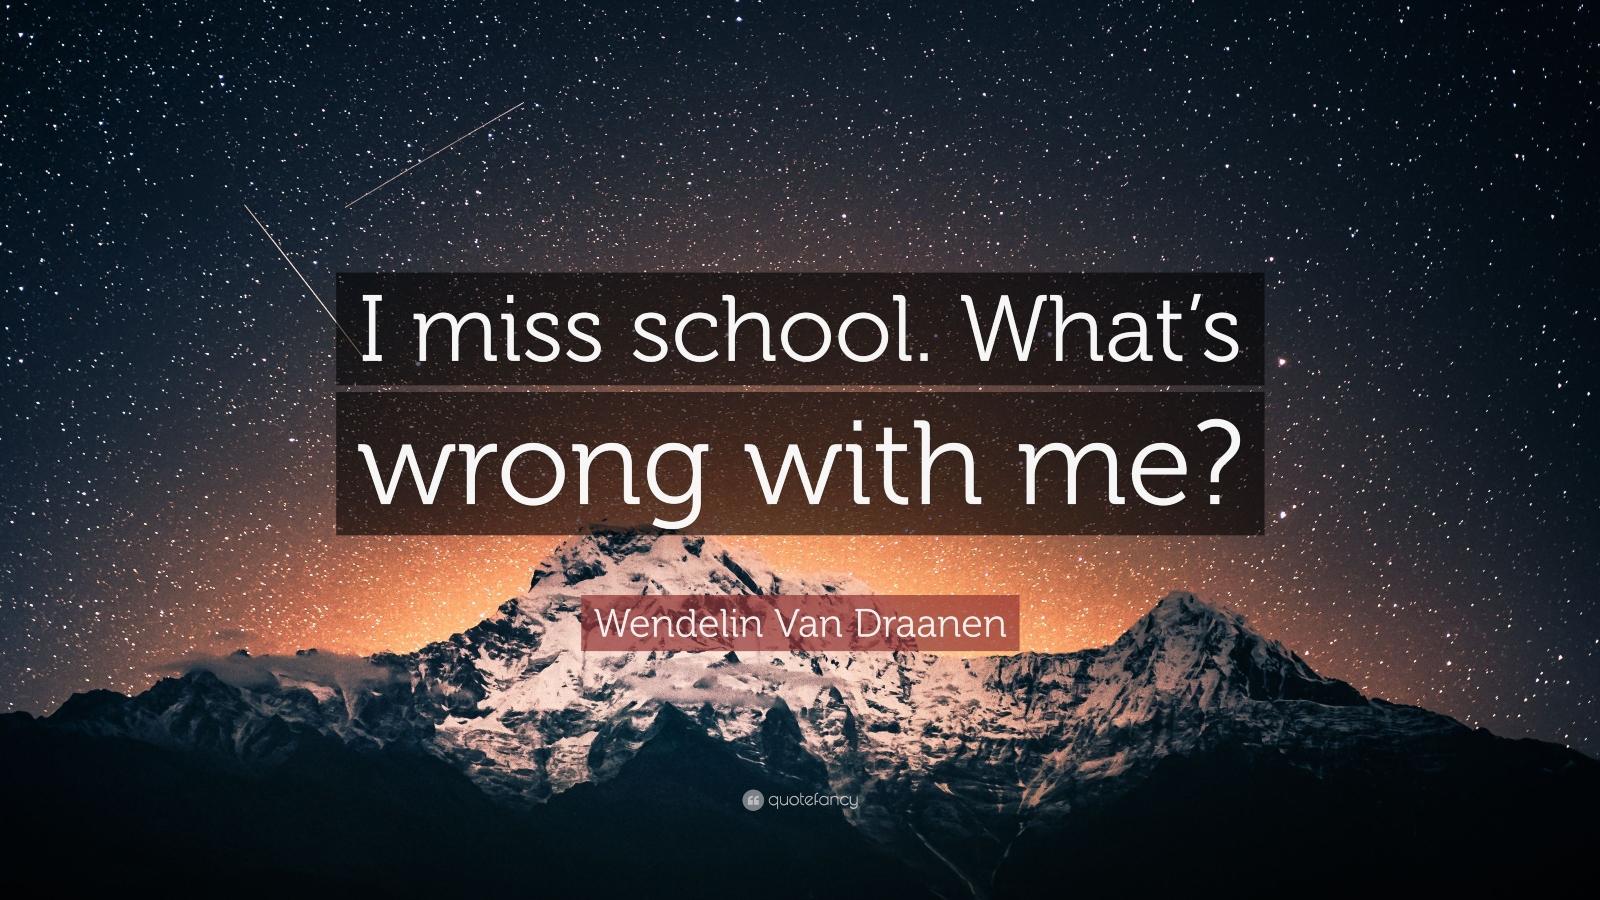 Do you miss school?